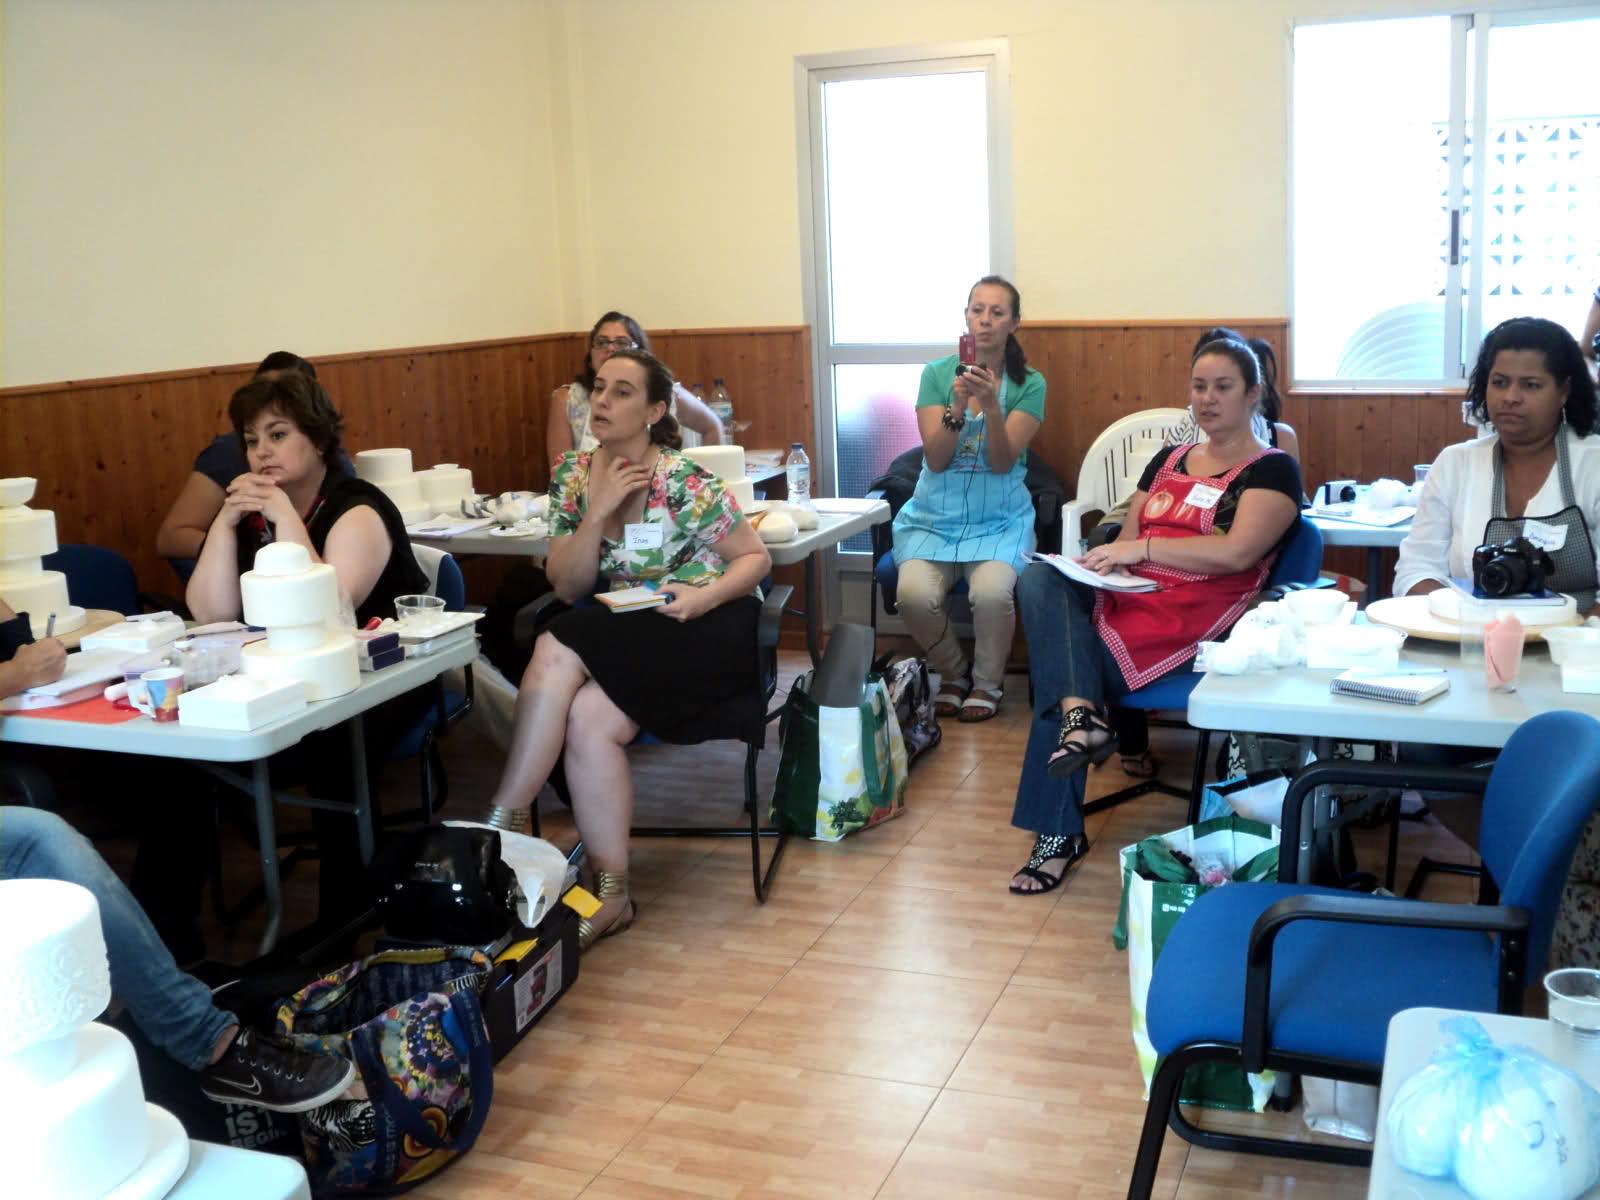 Comparto fotos del curso de dalila cabrita 2mcbvkh